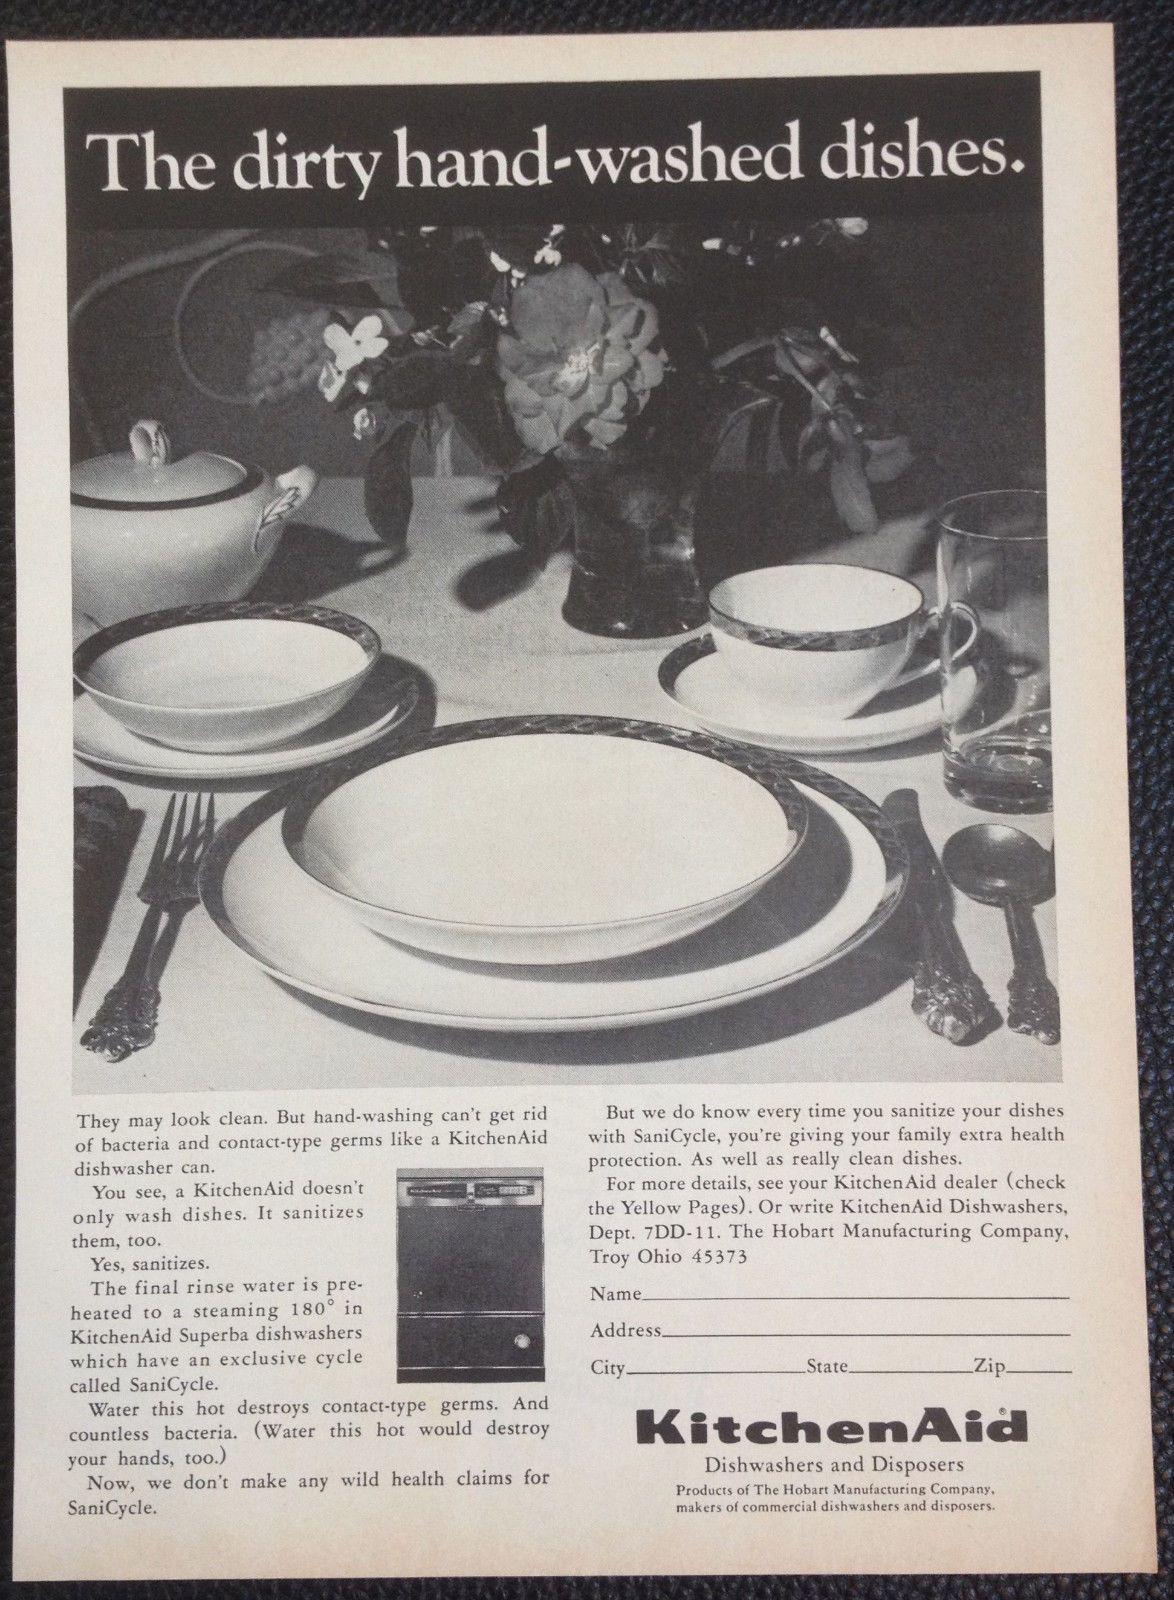 Vintage 1967 KitchenAid Dishwashers and Disposers Magazine